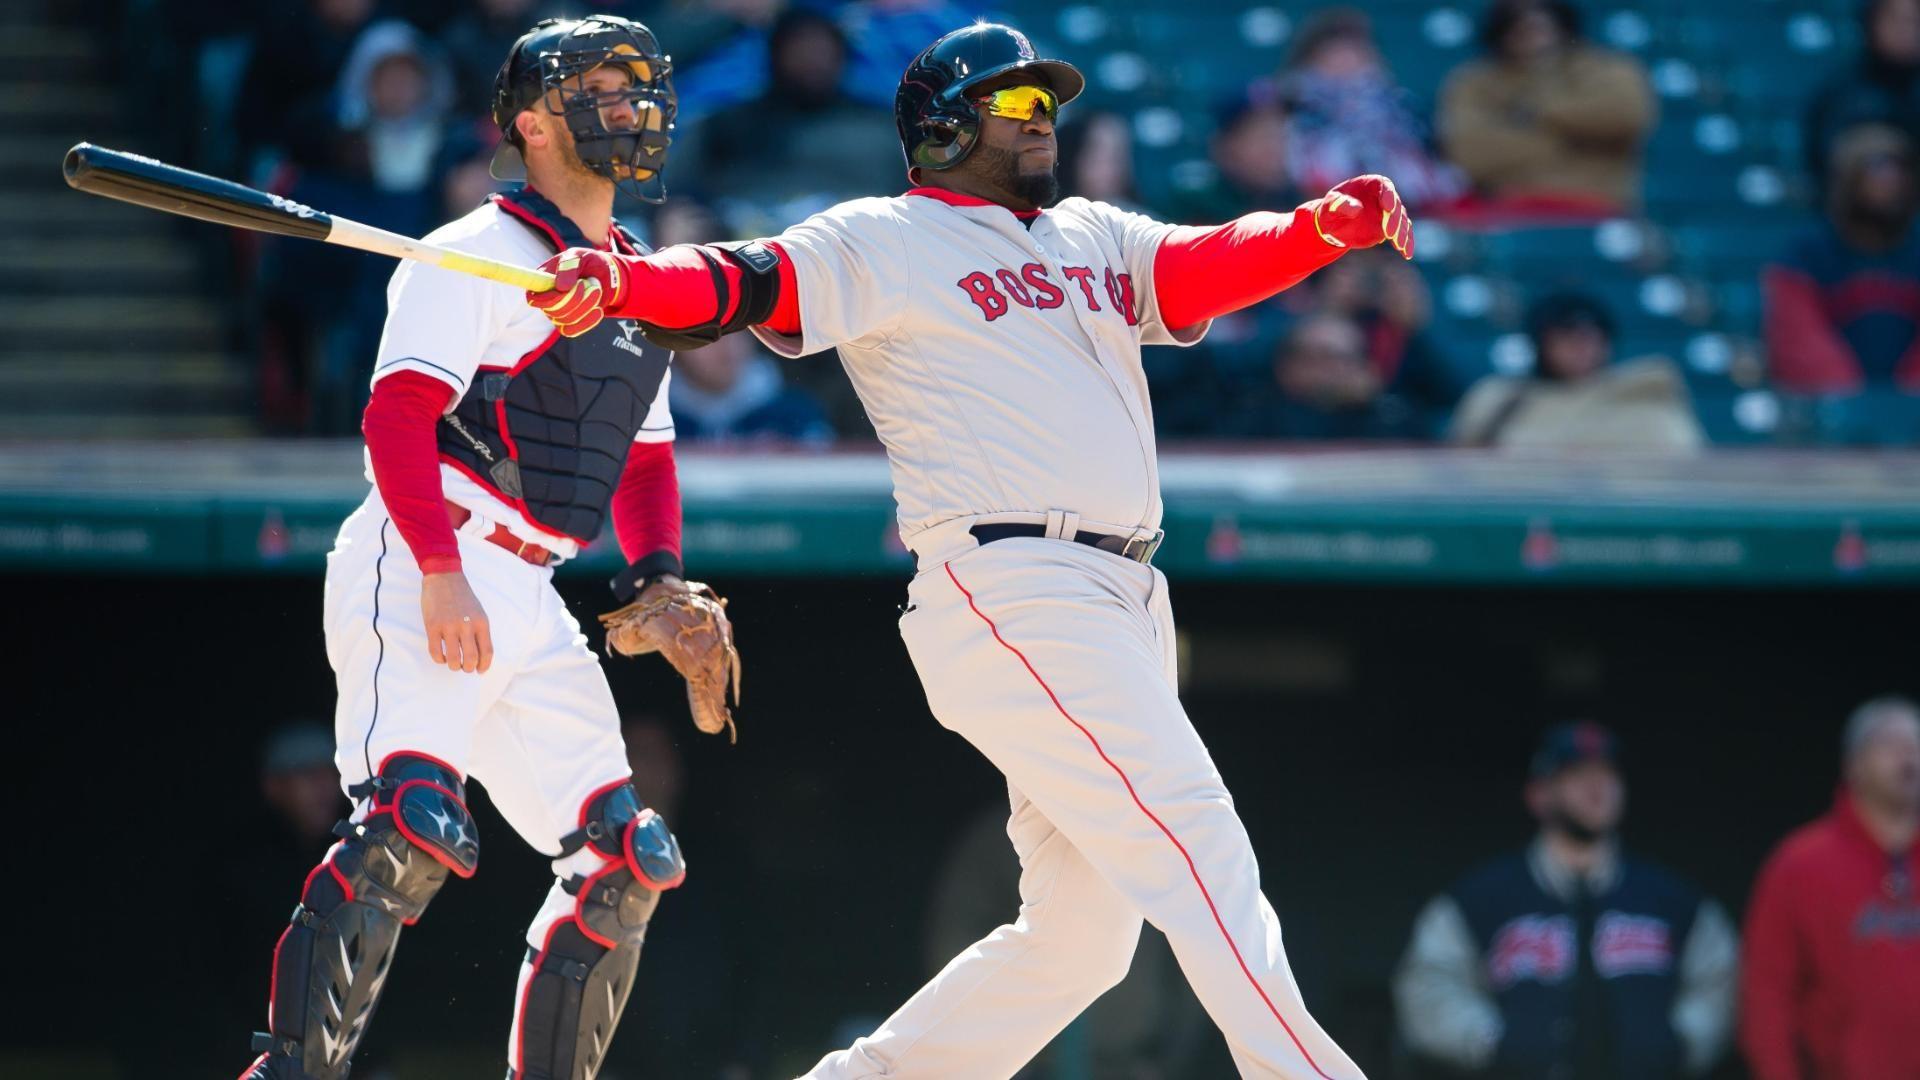 David Ortiz of Boston Red Sox hits 5th Opening Day HR